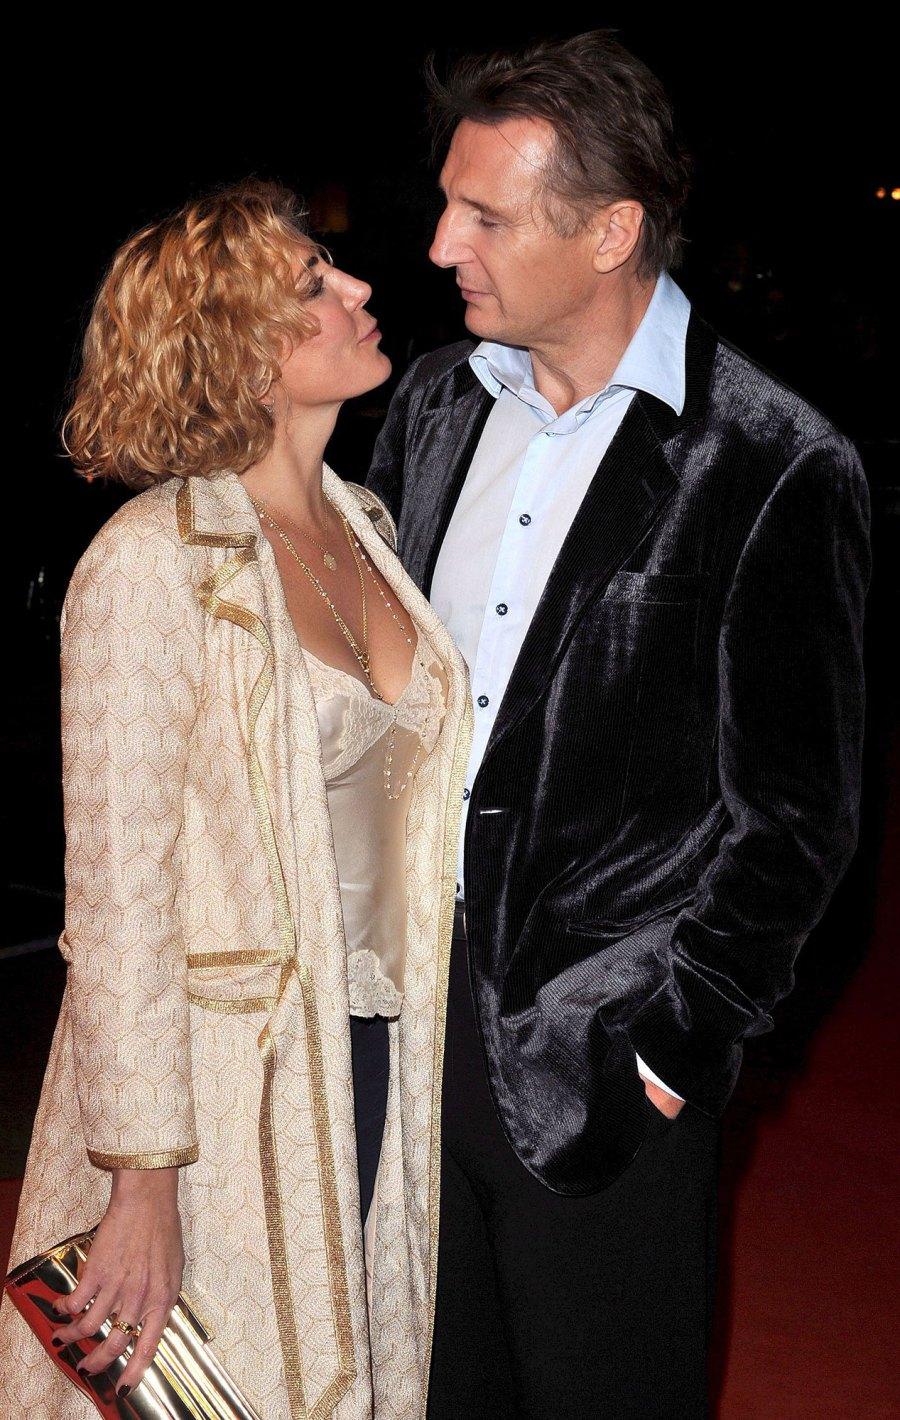 Liam Neeson Sweetest Quotes About Wife Natasha Richardson